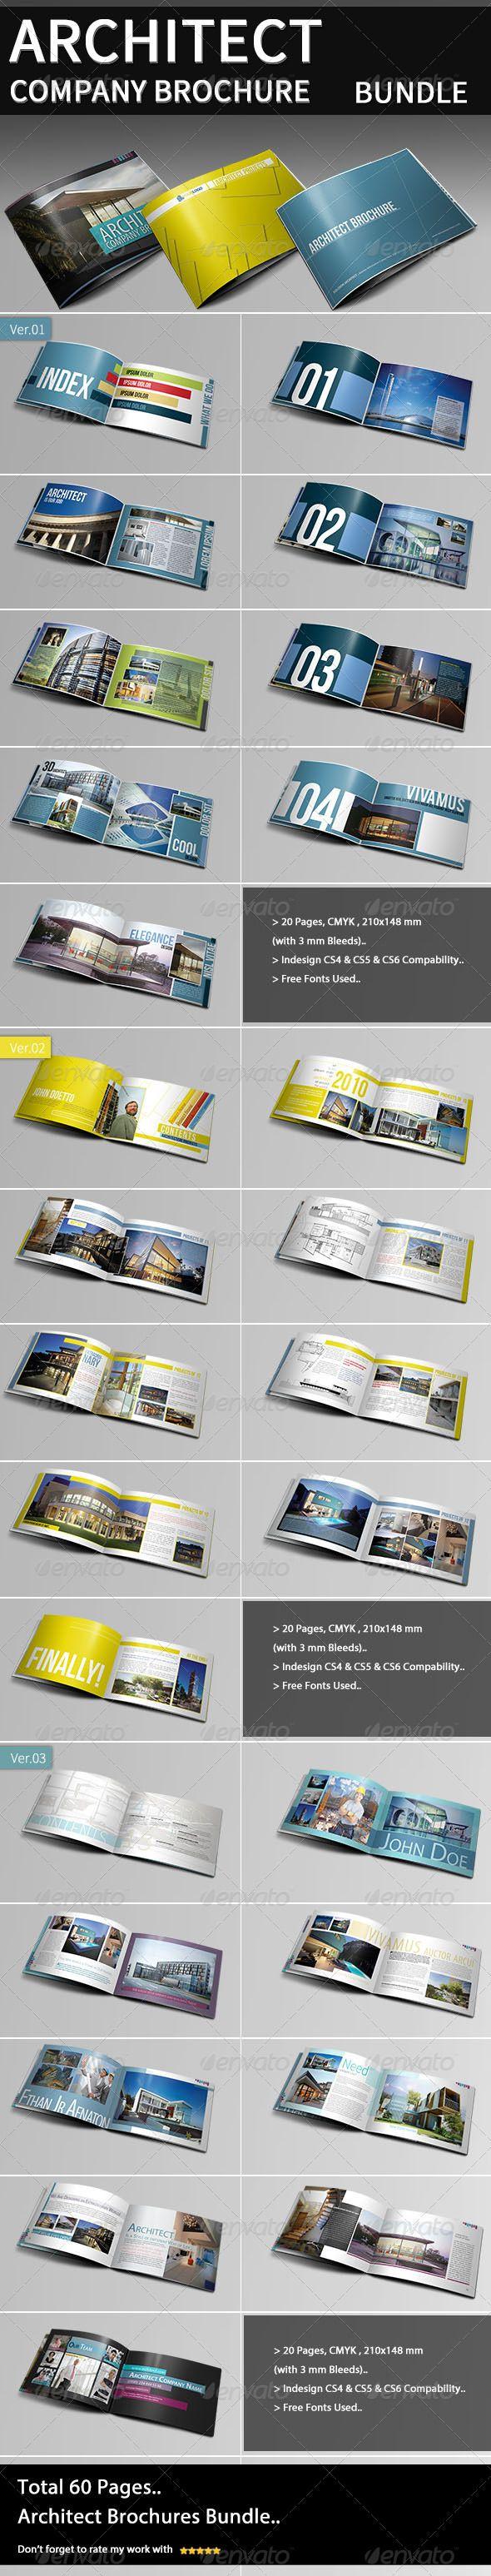 Architecture Company Brochure Bundle